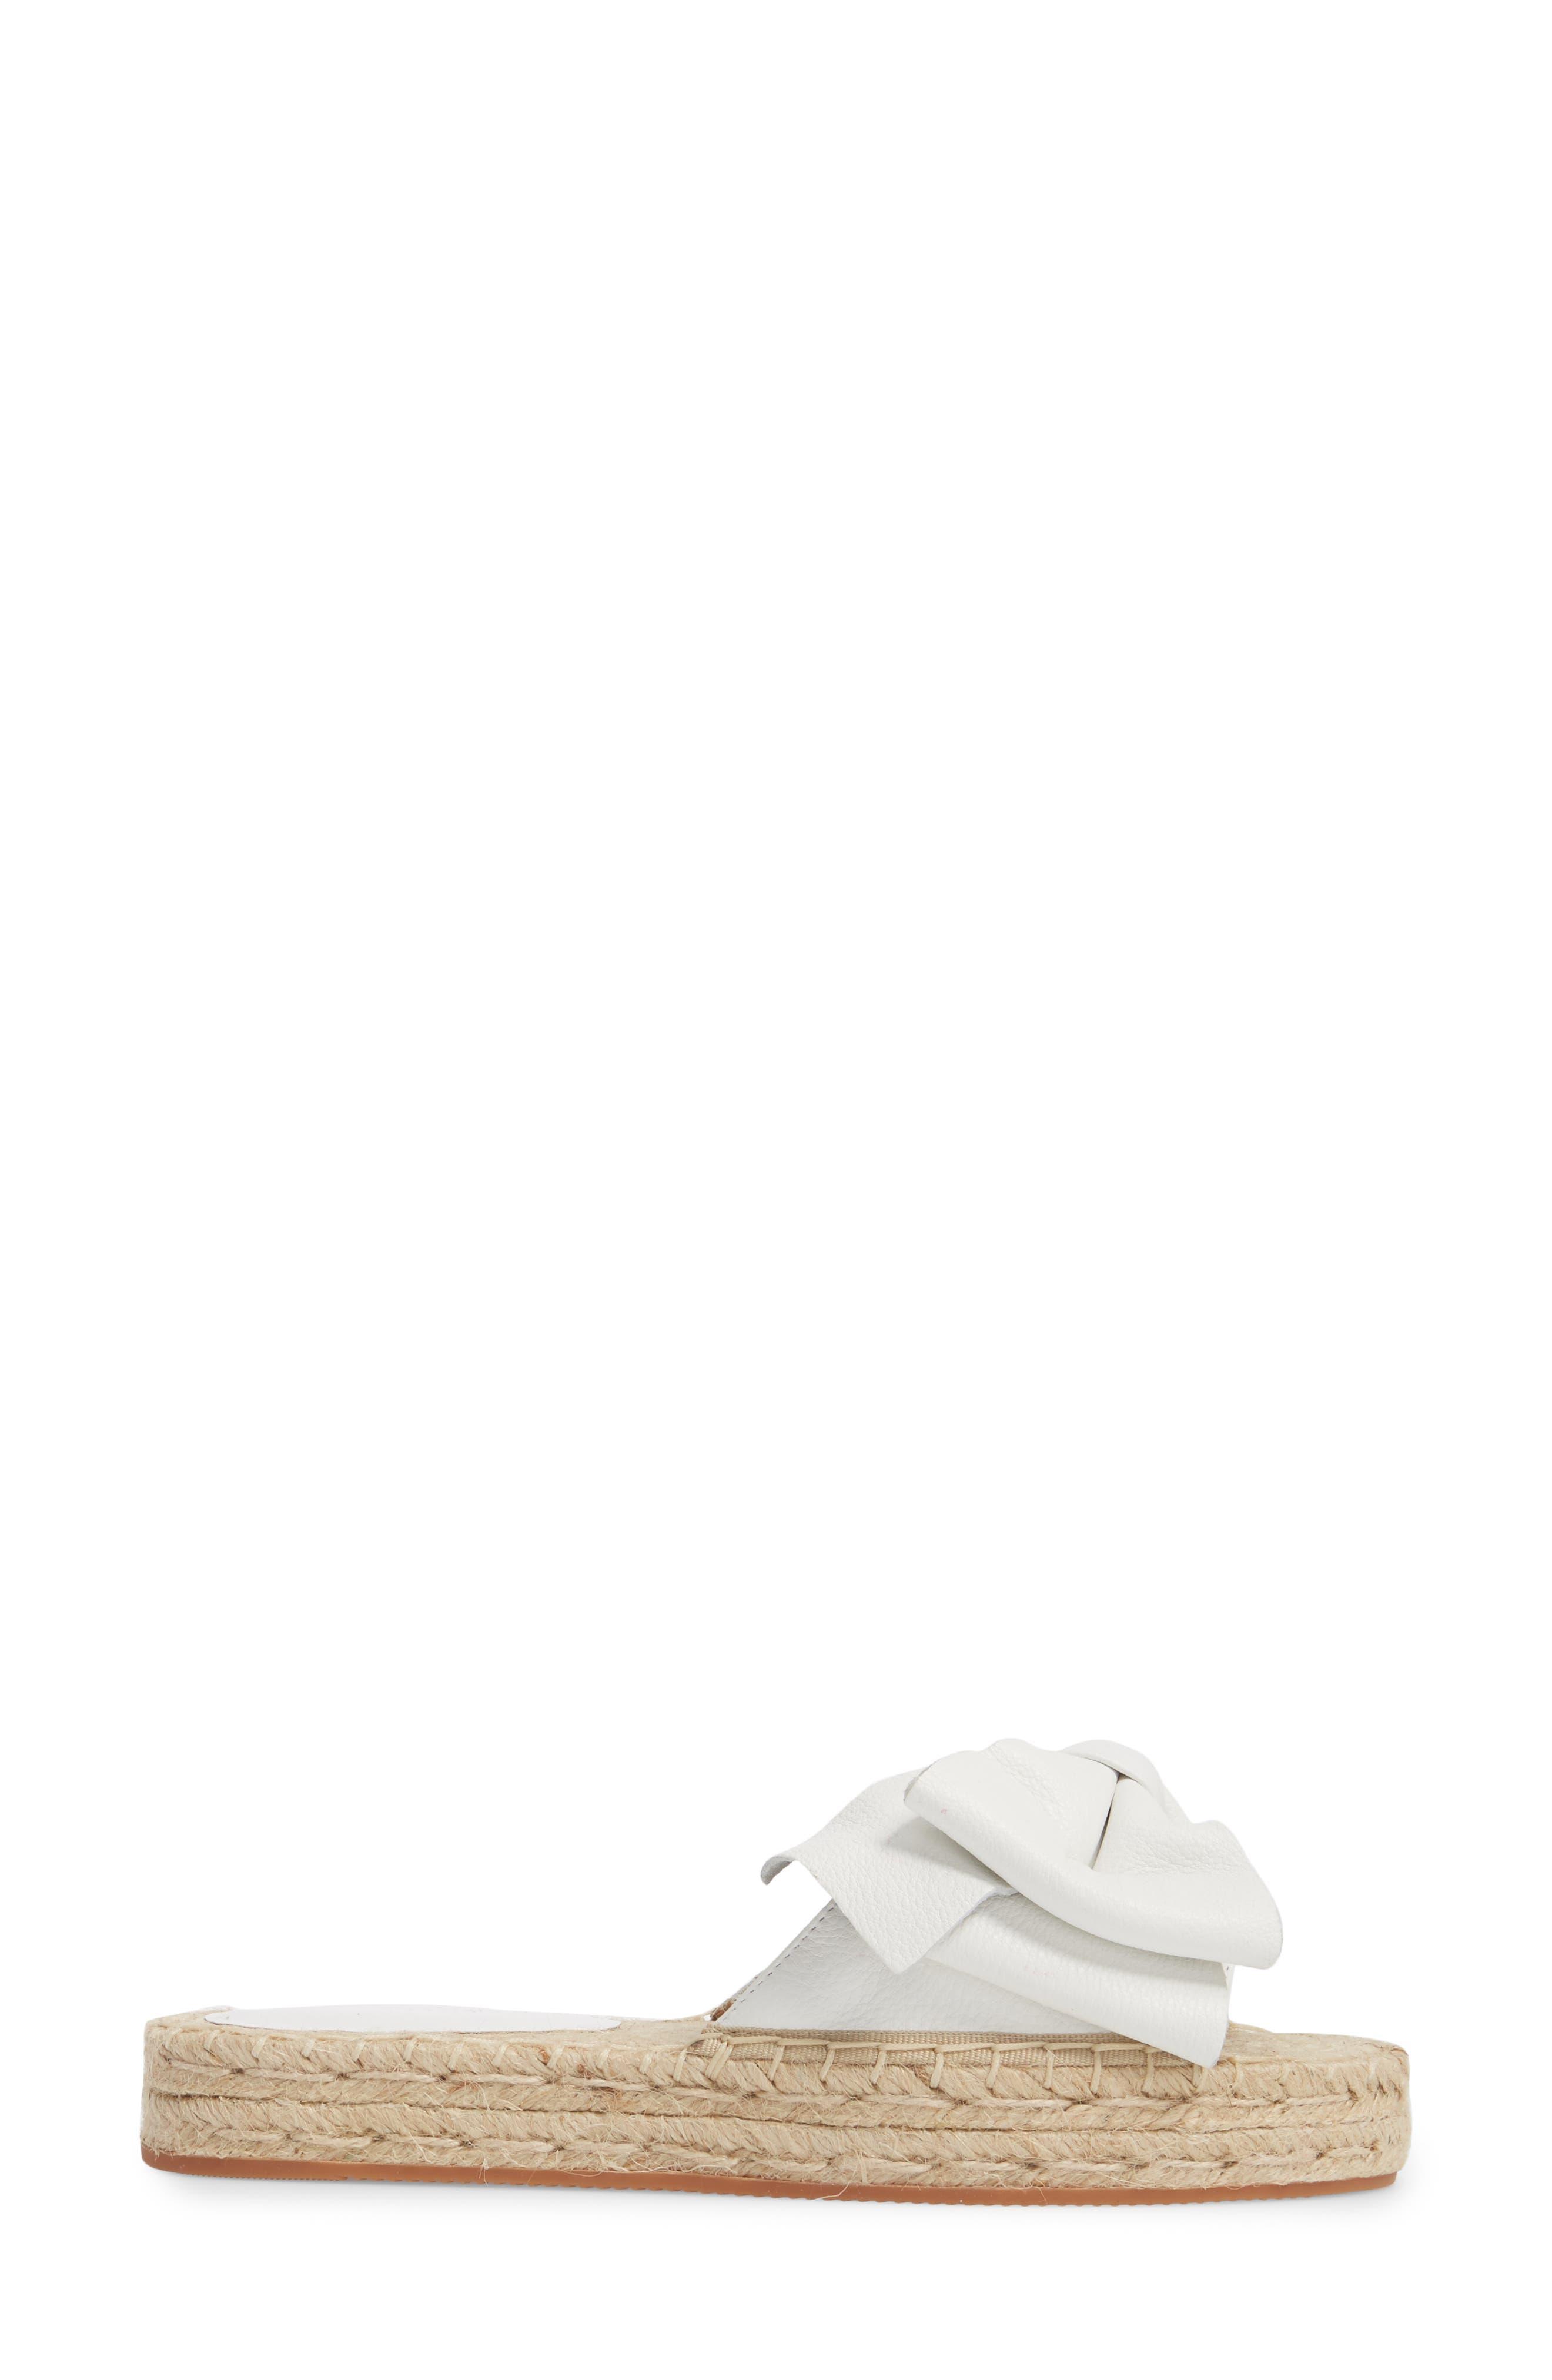 Giana Bow Slide Sandal,                             Alternate thumbnail 3, color,                             Optic White Leather